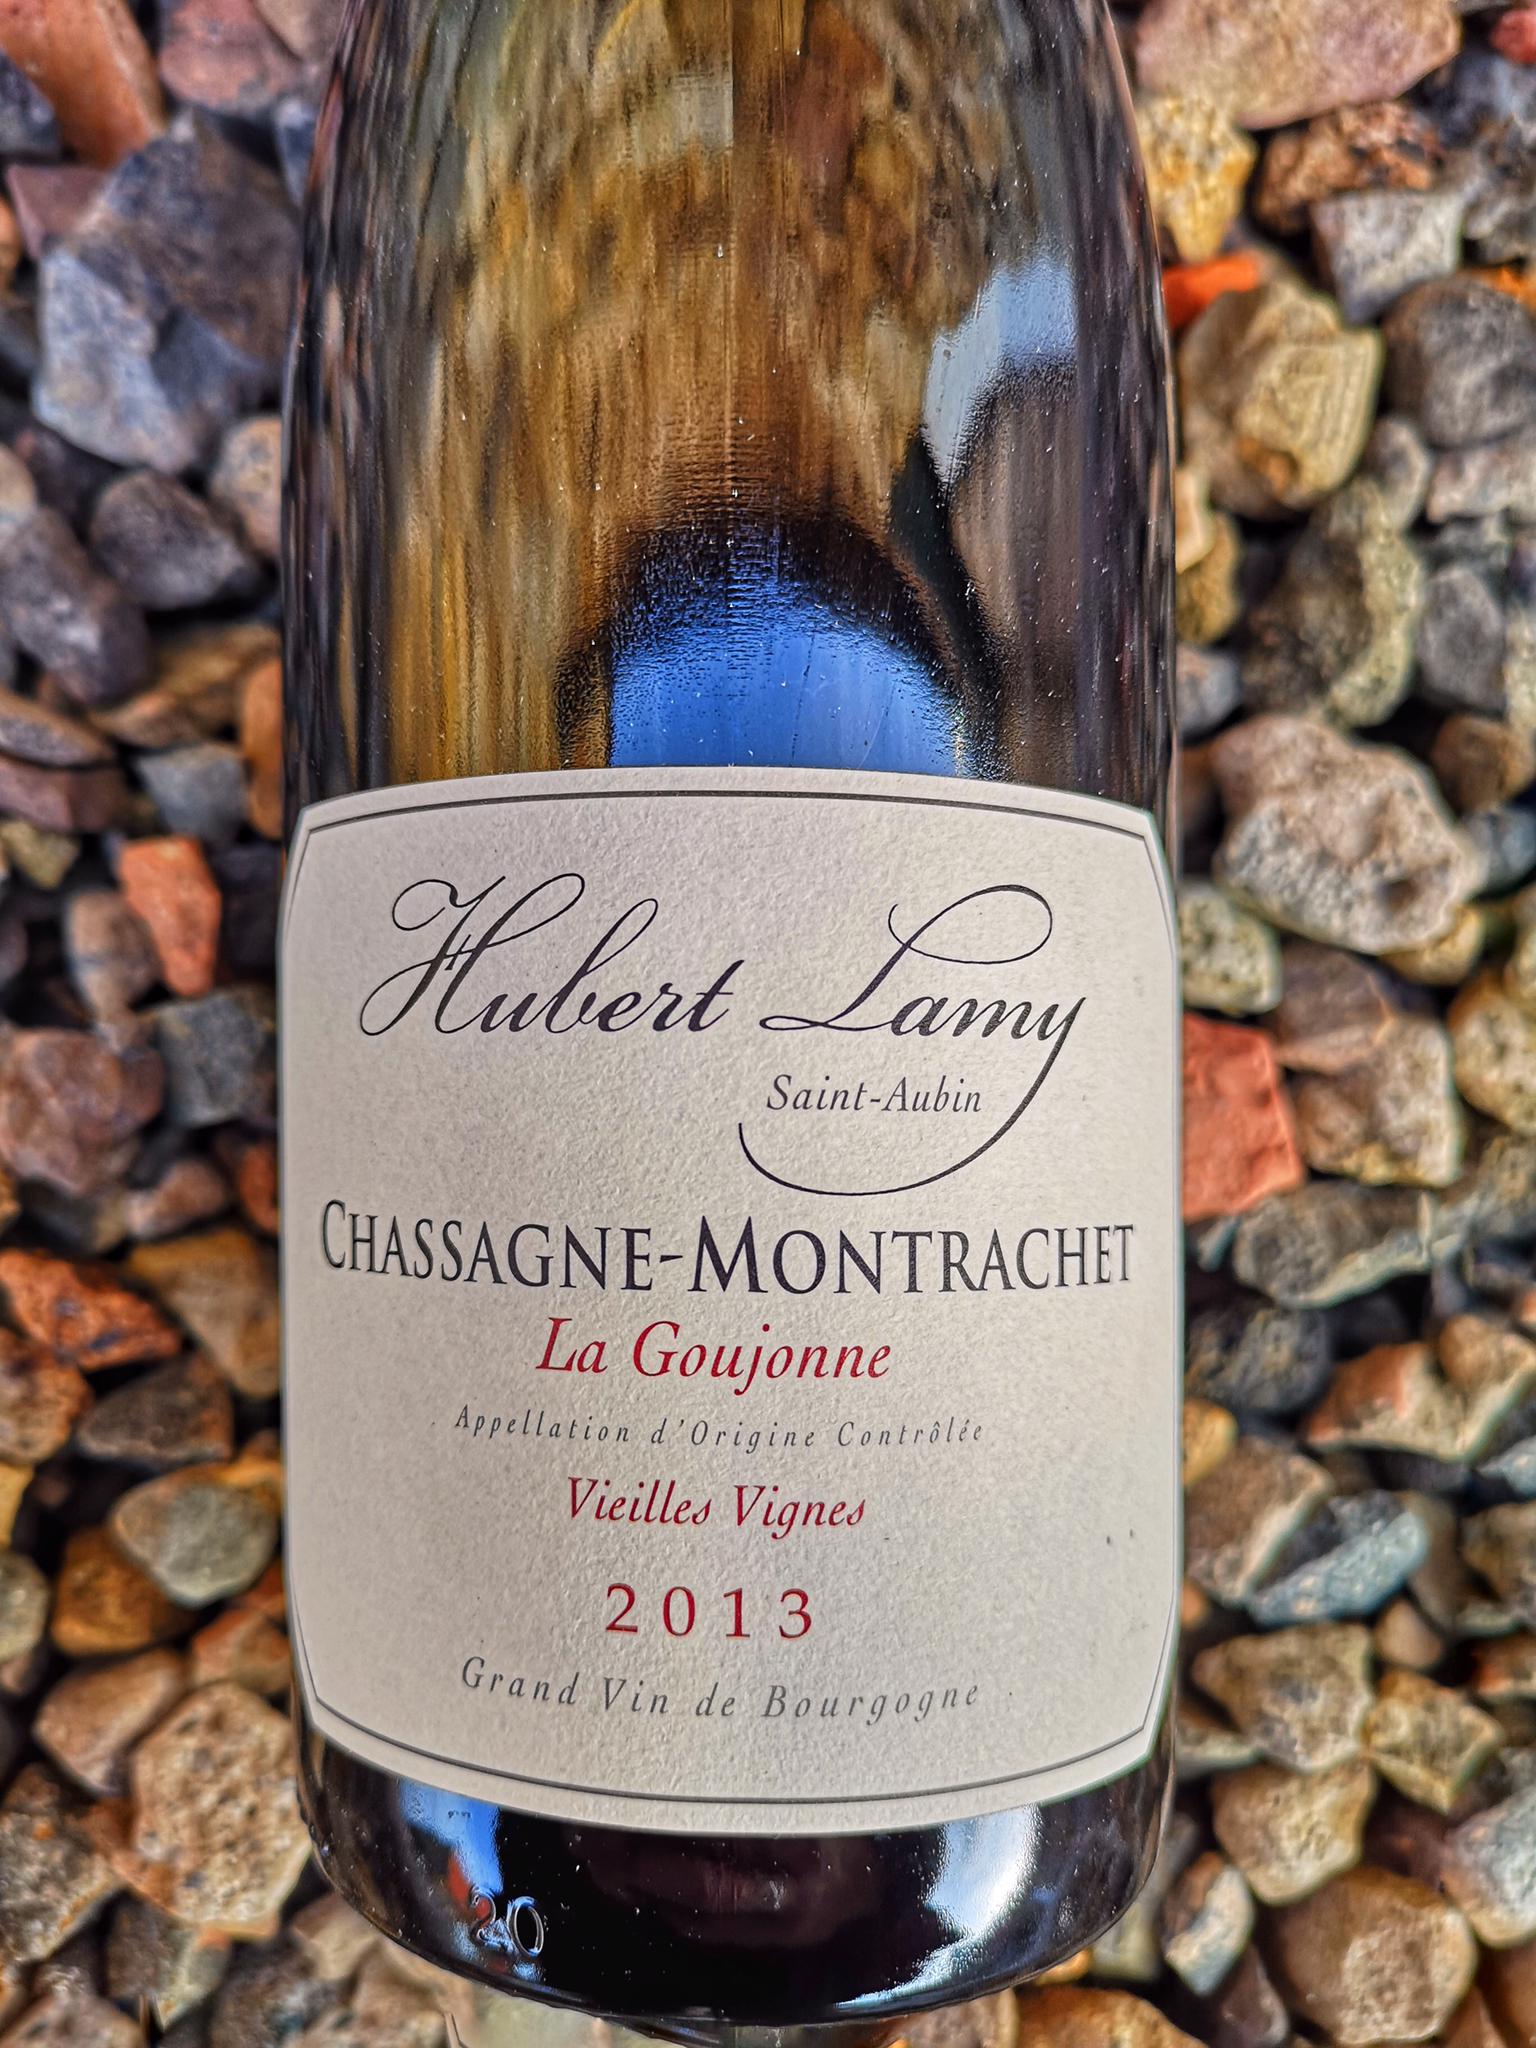 Hubert Lamy Chassagne Montrachet ROUGE La Goujonne 2013 00142